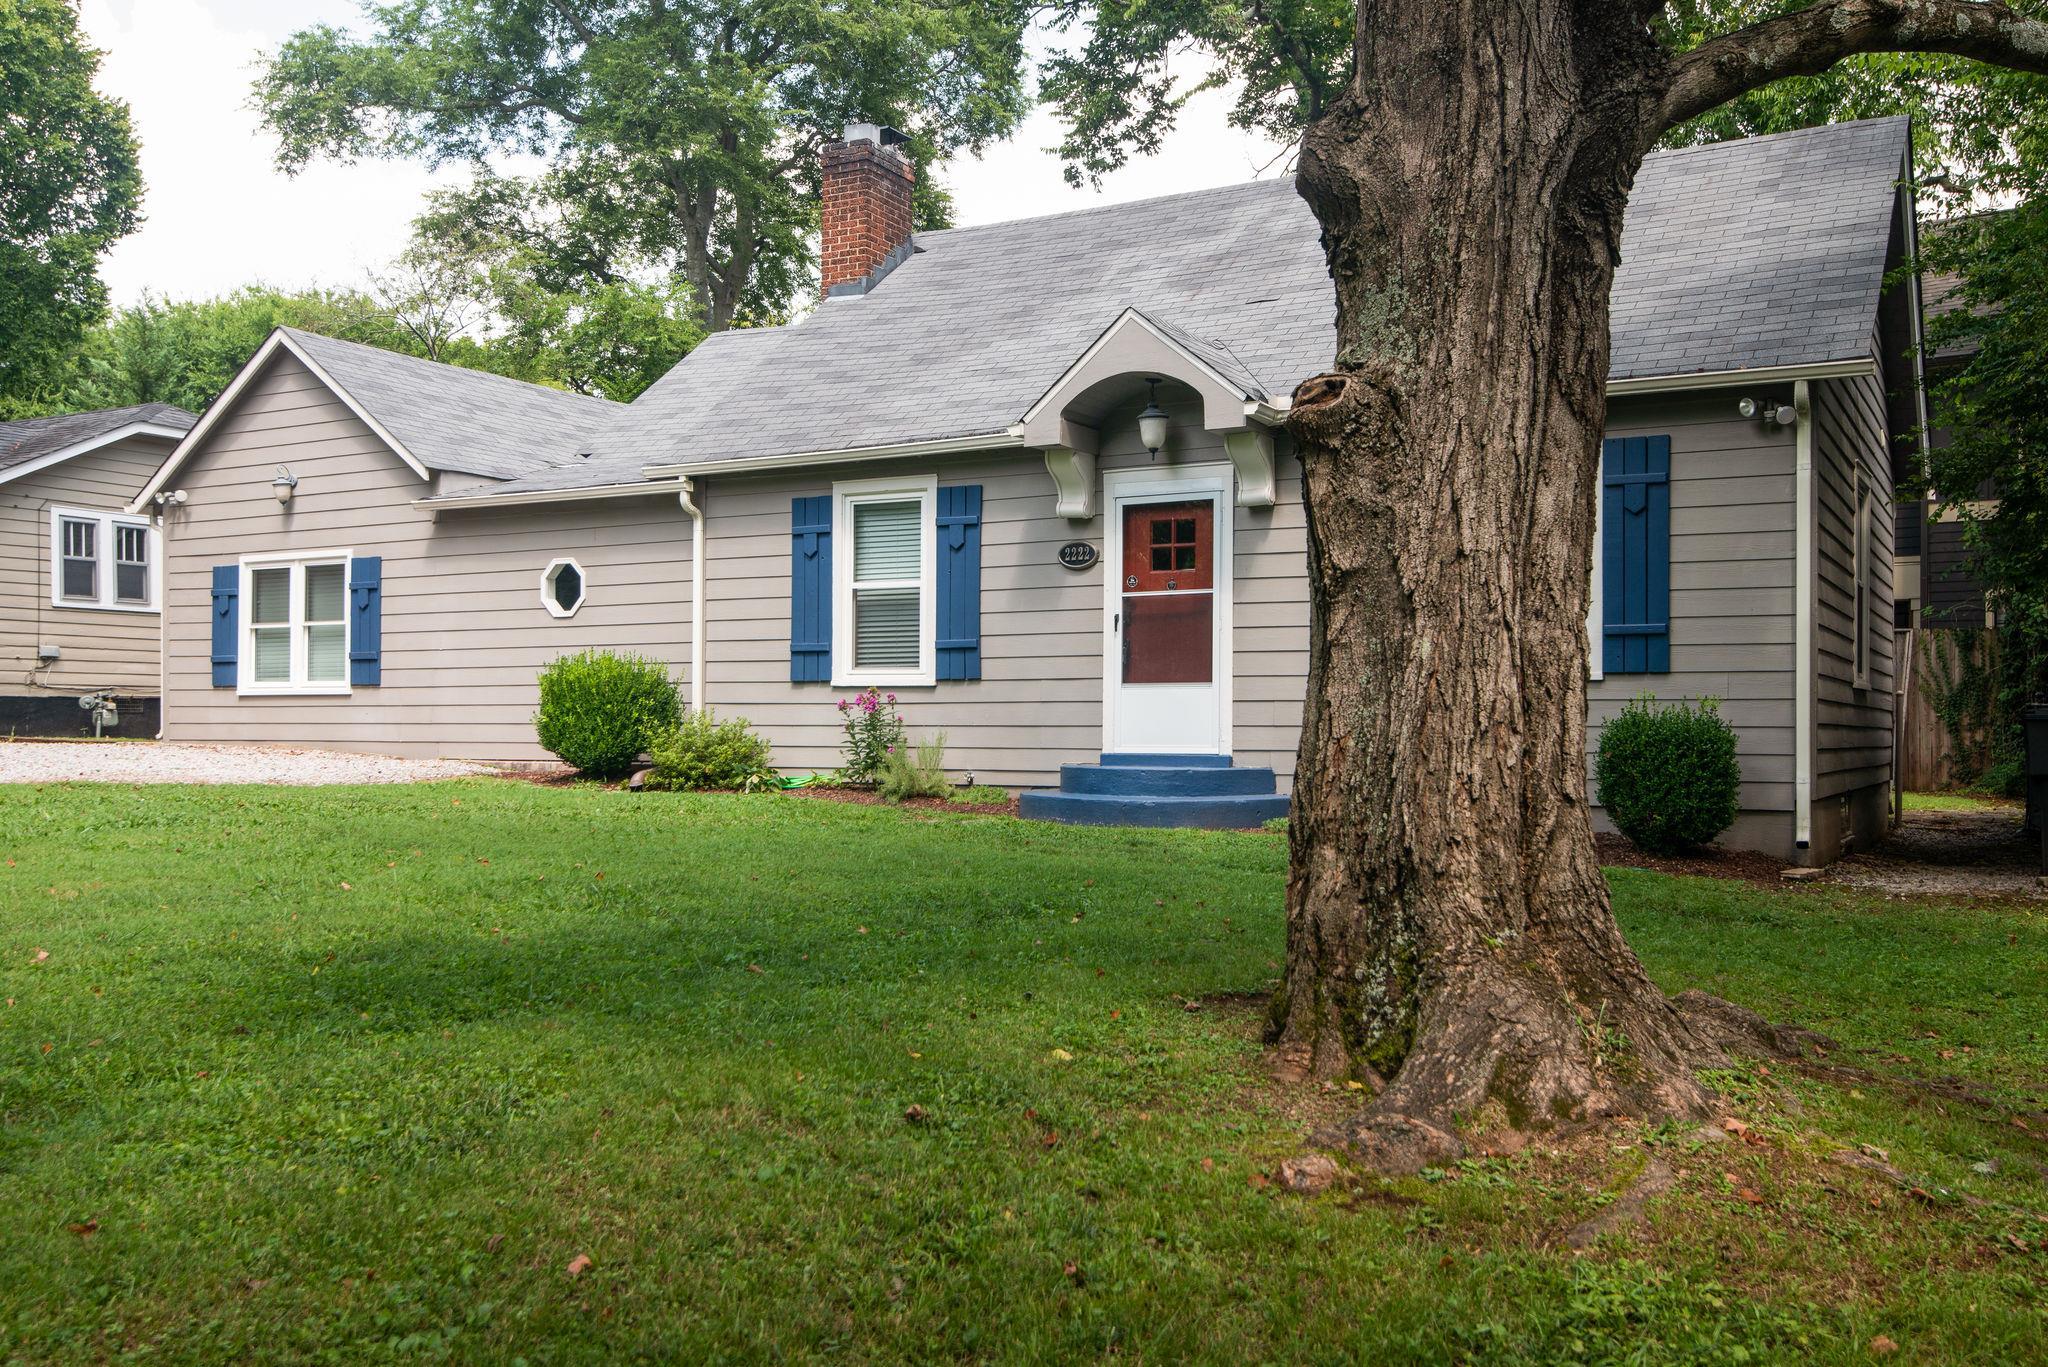 2222 30Th Ave S, Nashville, TN 37212 - Nashville, TN real estate listing